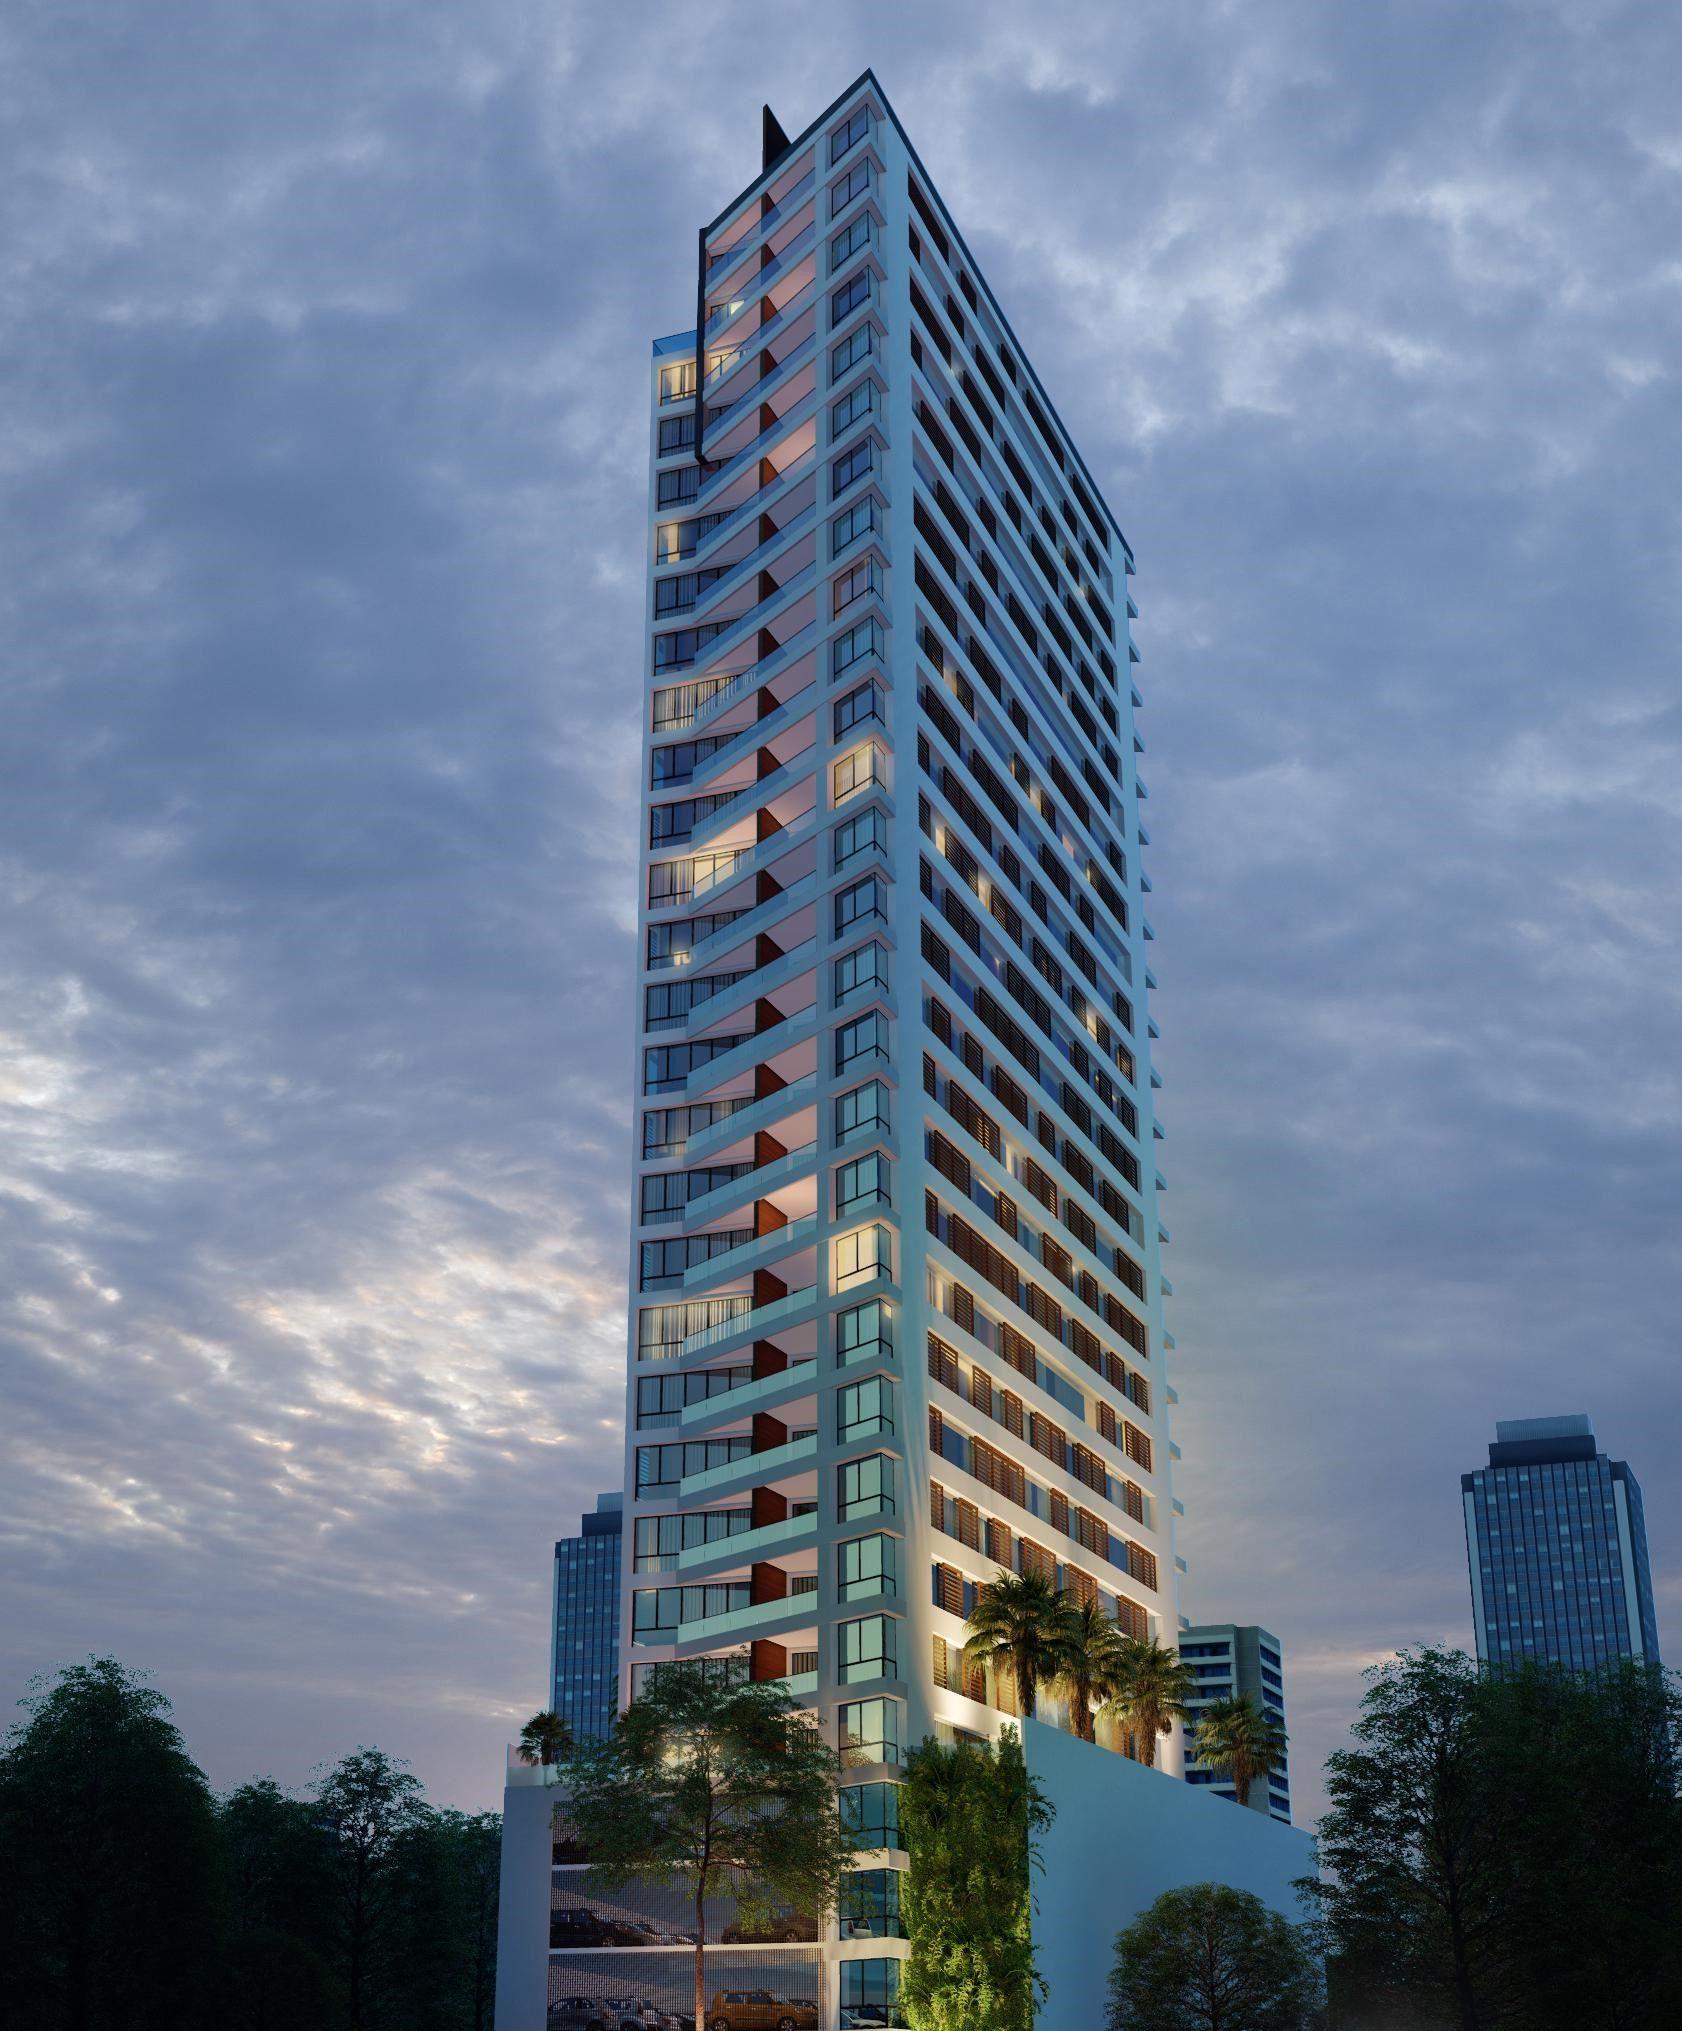 Impresionante edificio residencial renderizado en solo 20segs por @guih.felix   Only 20 secs @guih.felix took to render this amazing project #Lumion